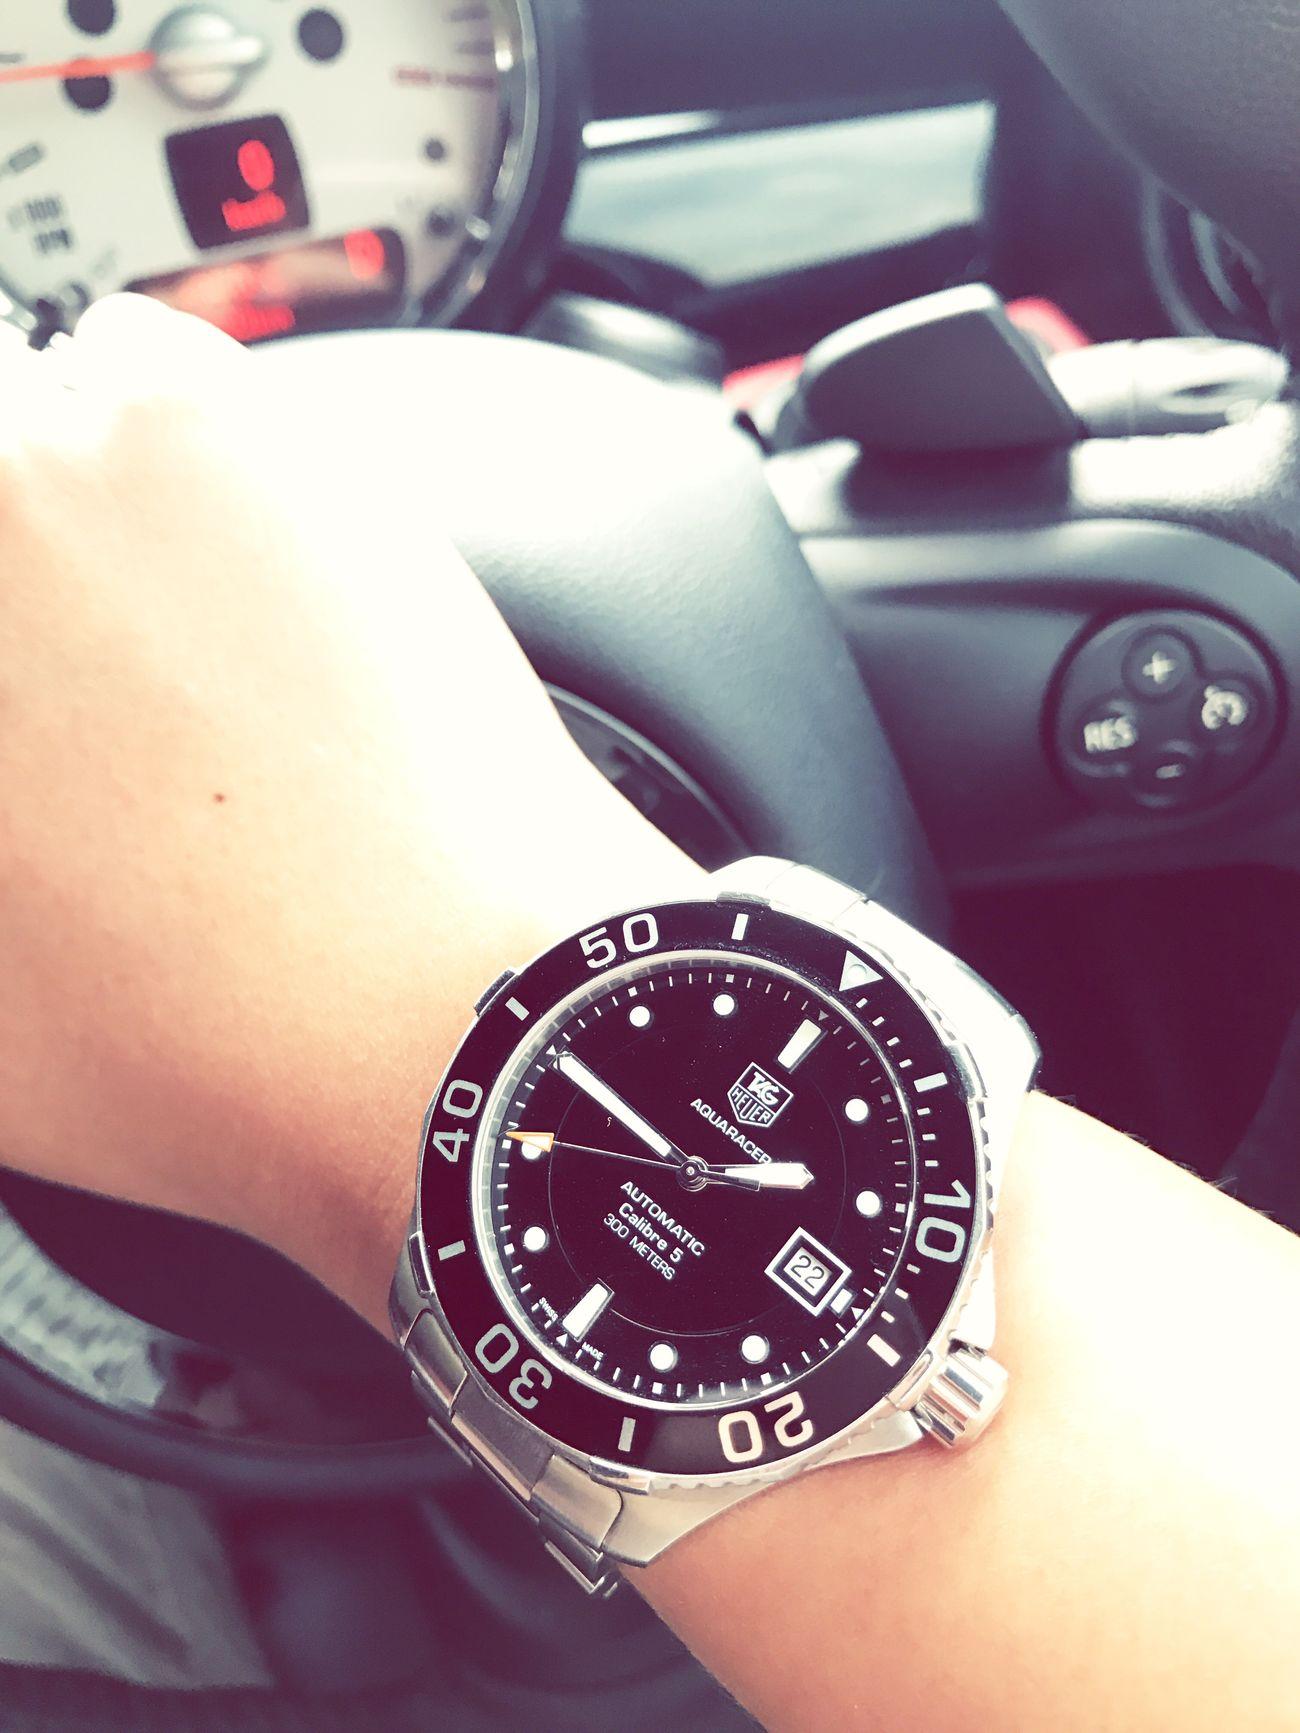 TIME GO FAST Tagheuer Calibre50